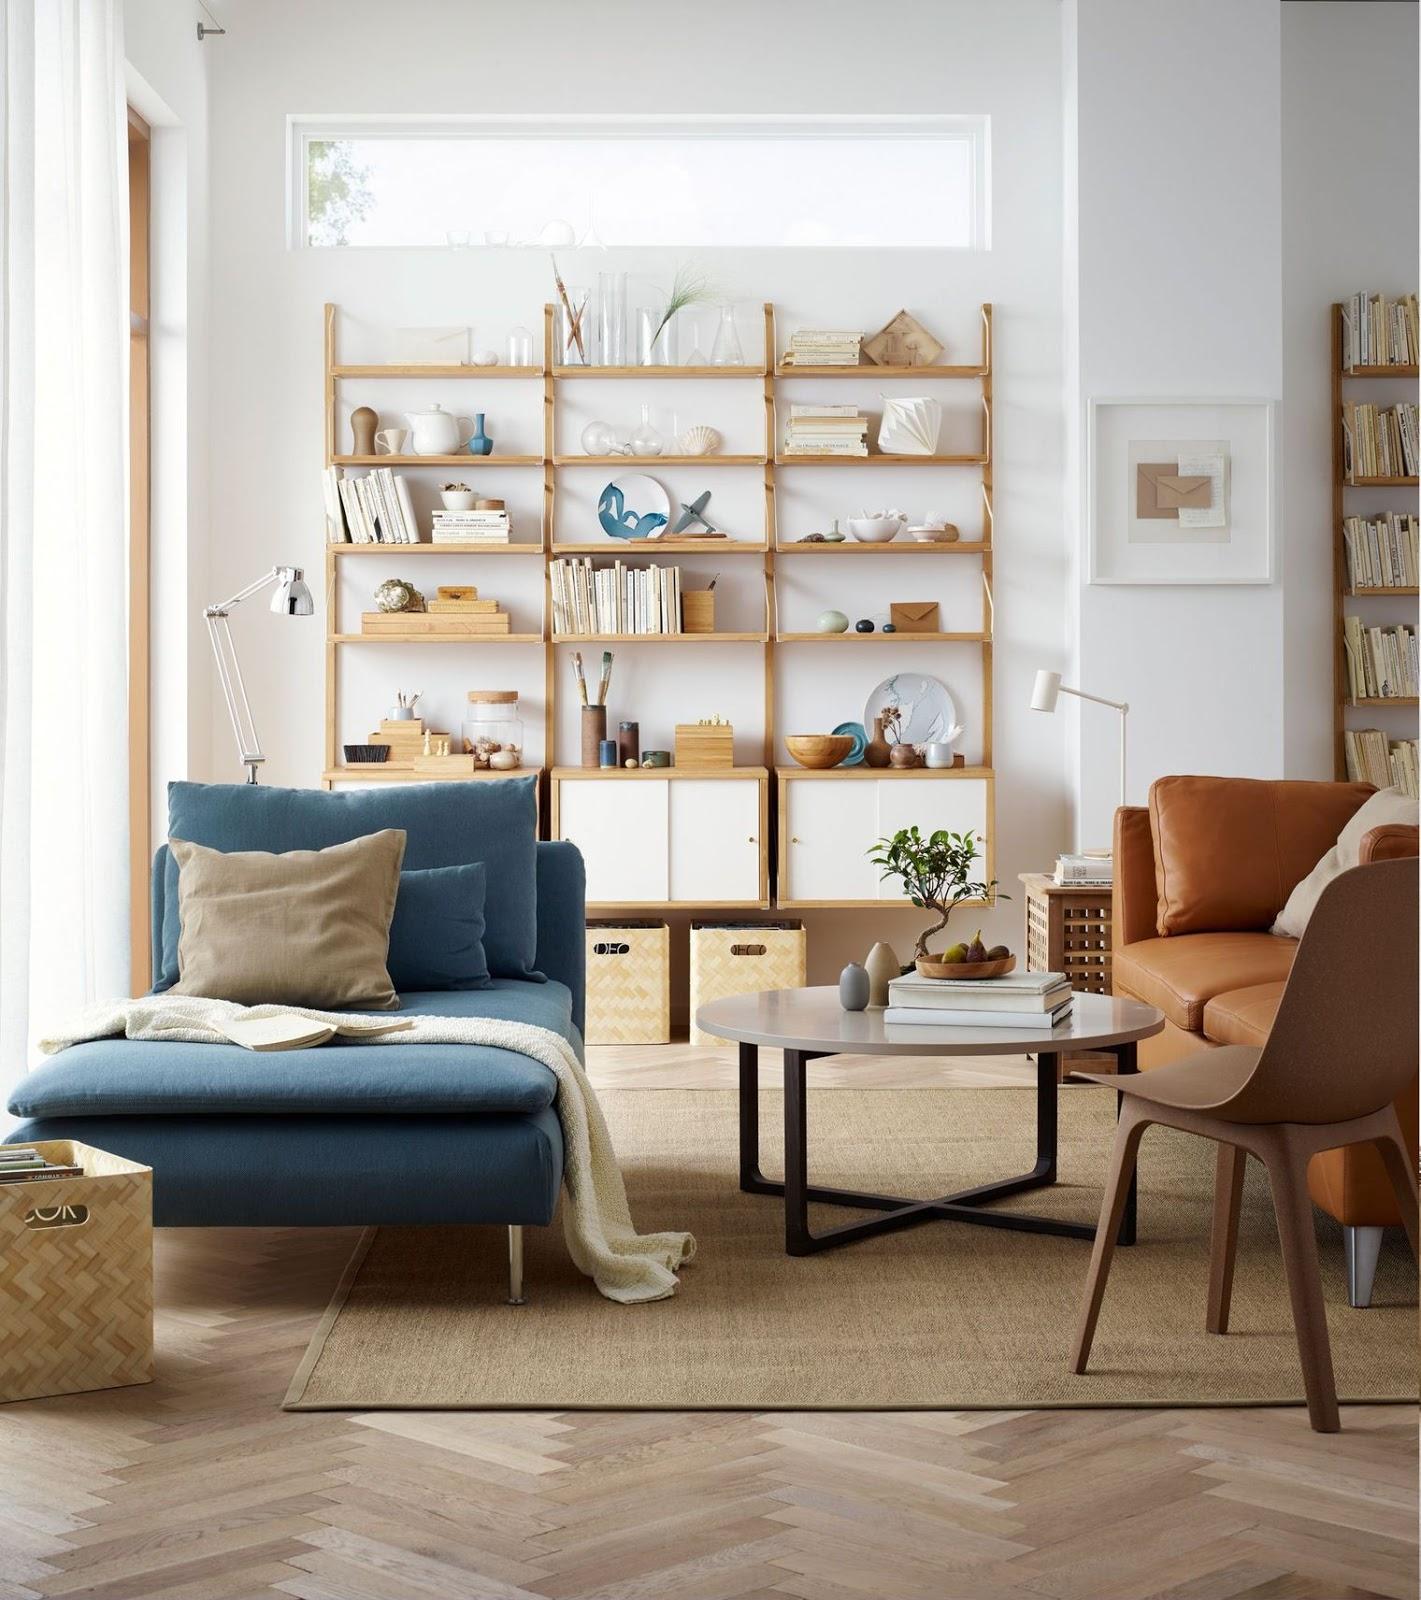 Ikea Len Katalog stories in pictures katalog ikea 2018